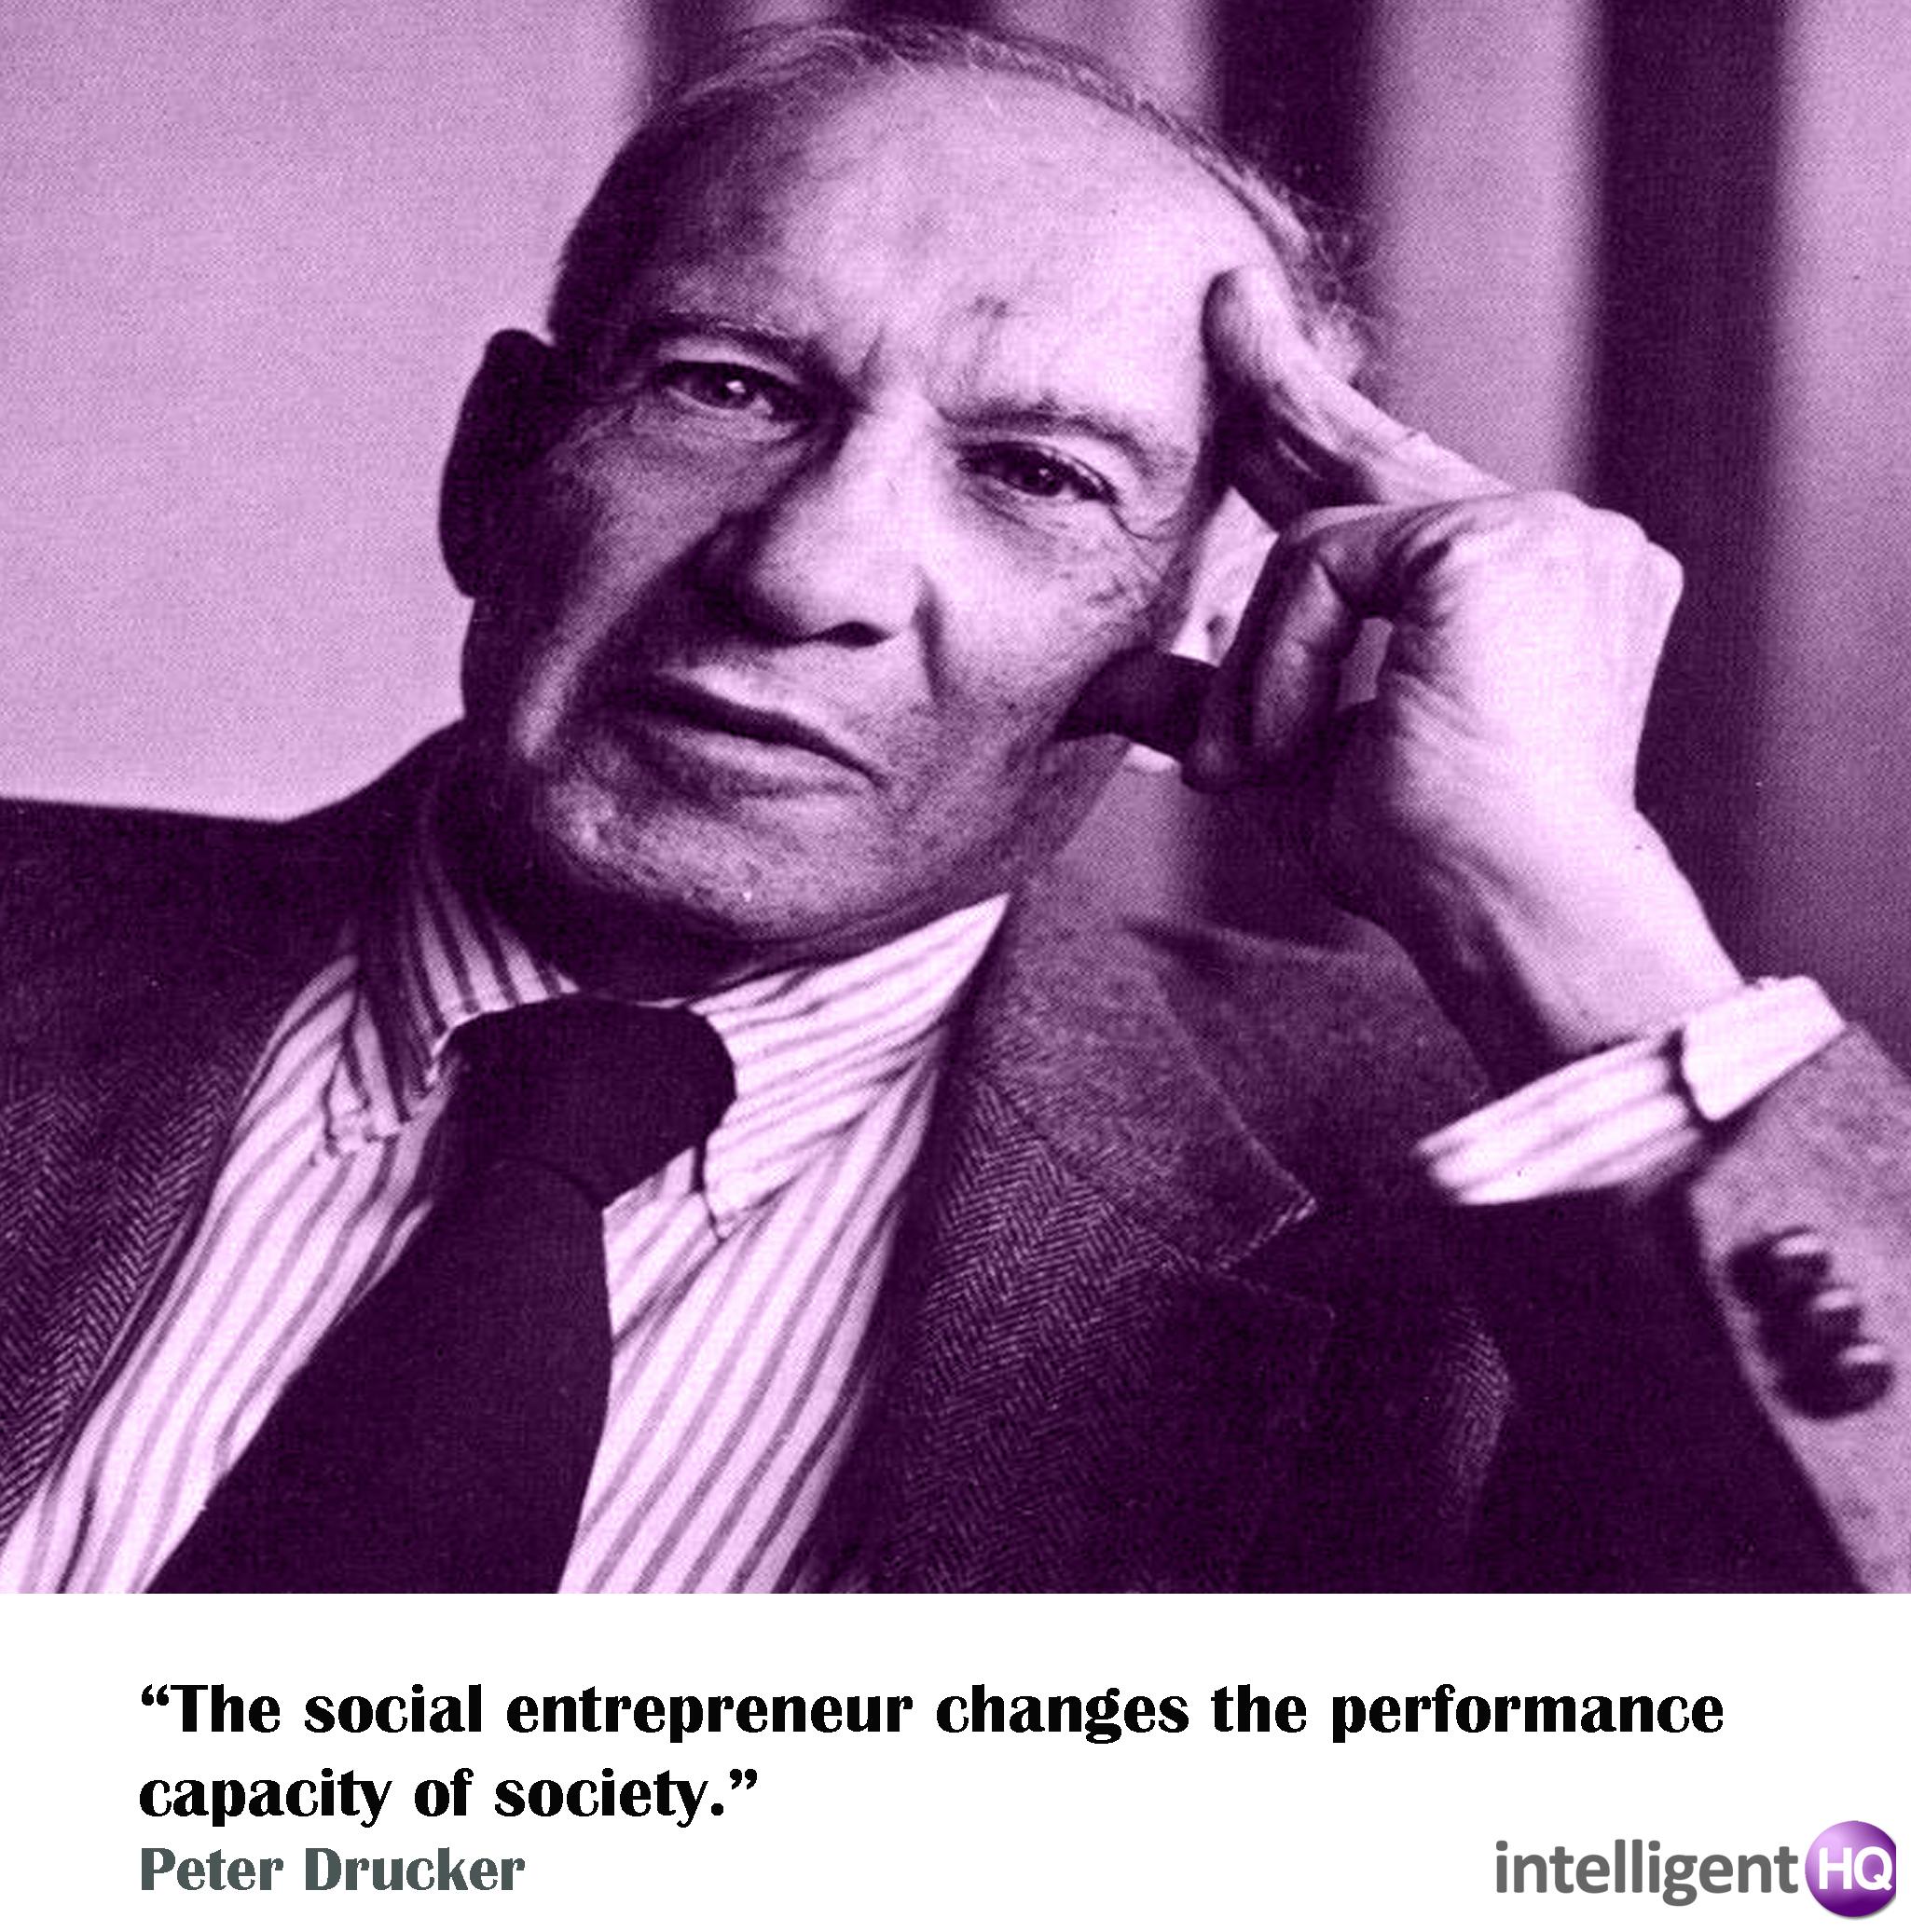 Quote by Peter Drucker. Intelligenthq